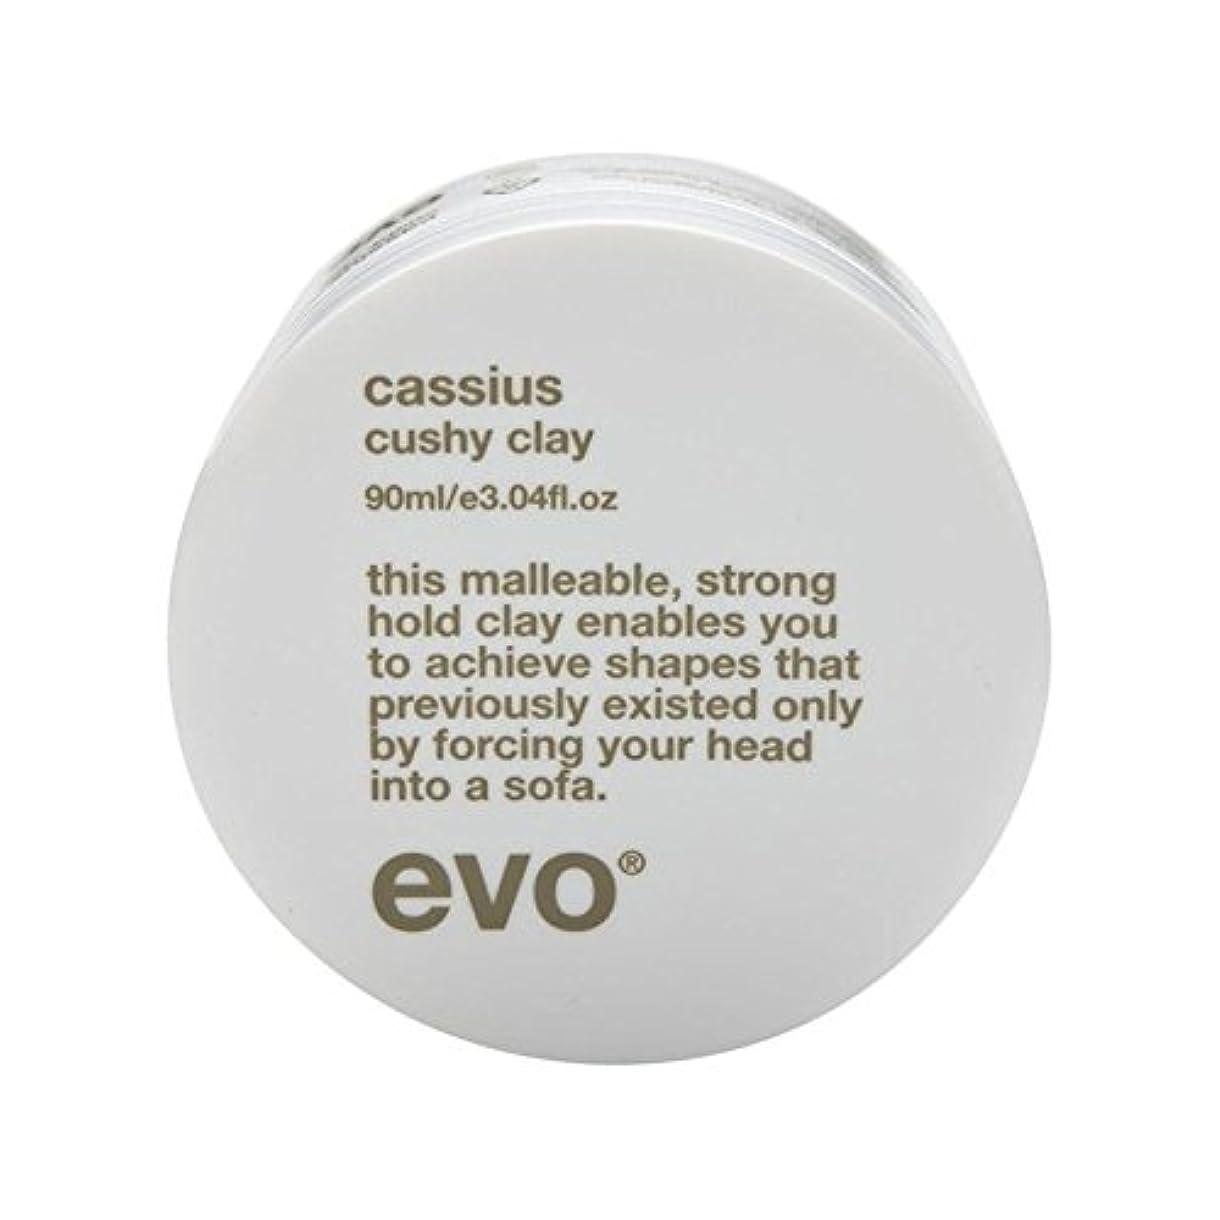 Evo Cassius Cushy Clay 90G - エボカシウス楽な粘土90グラム [並行輸入品]